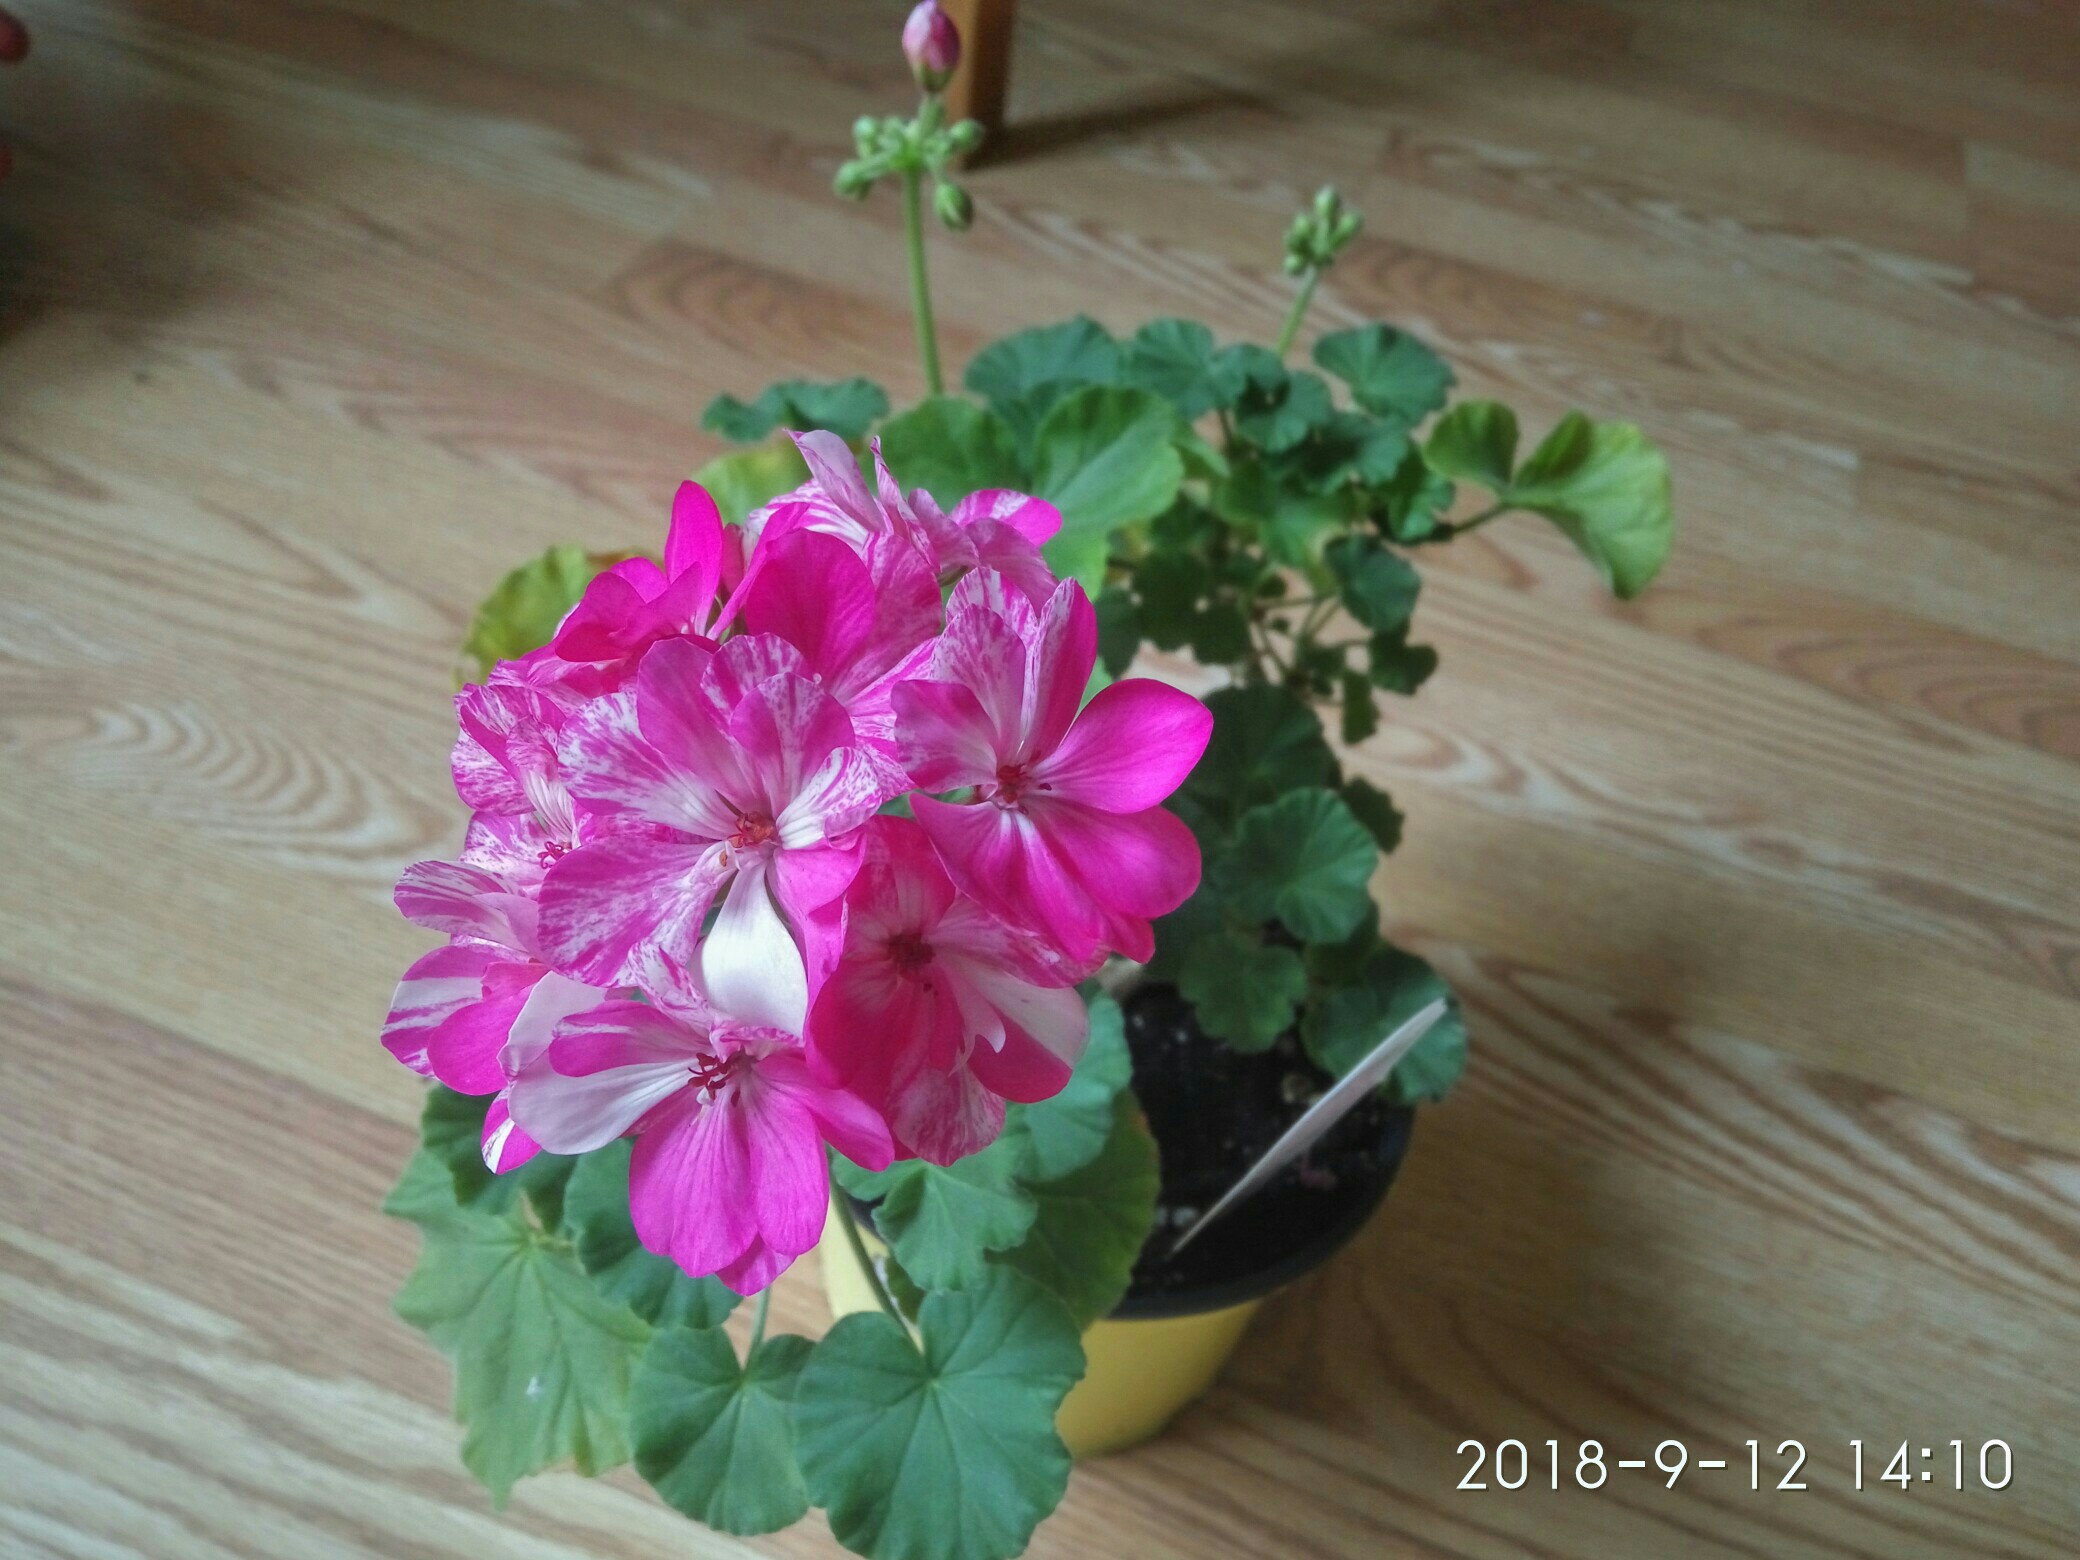 "Мои цветочки ... Занятие для души)))""  - Страница 2 OmZ749lwgGU"